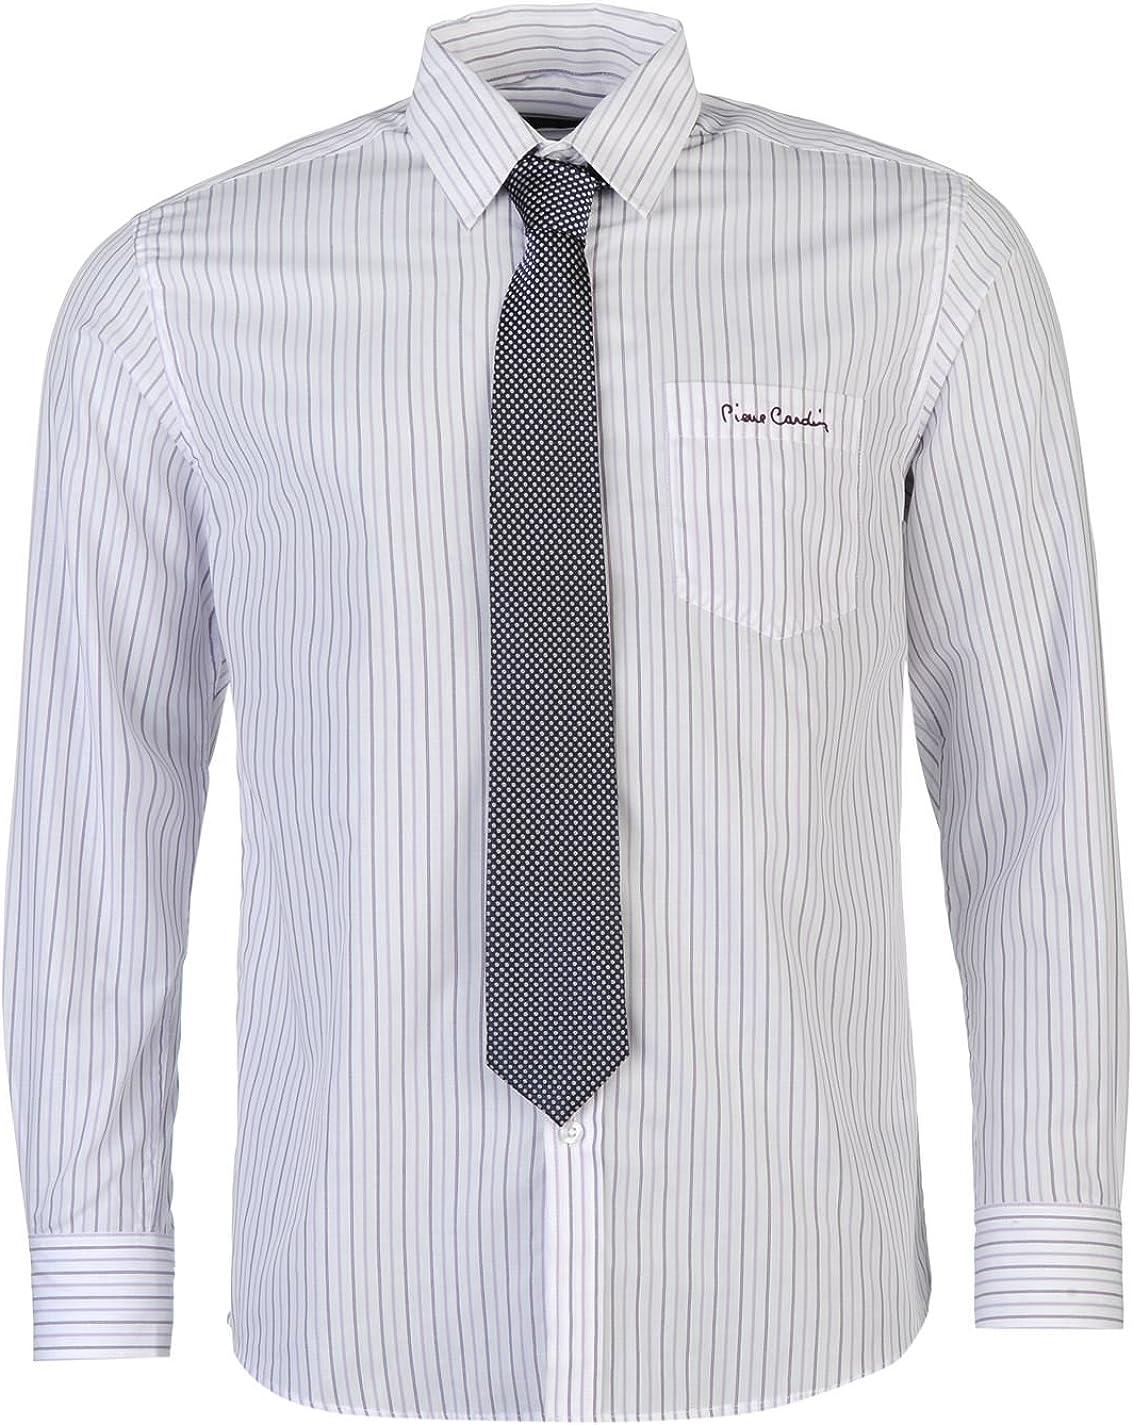 Pierre Cardin Hombre Camisa Ropa Mangas Largas Casual Vestir ...